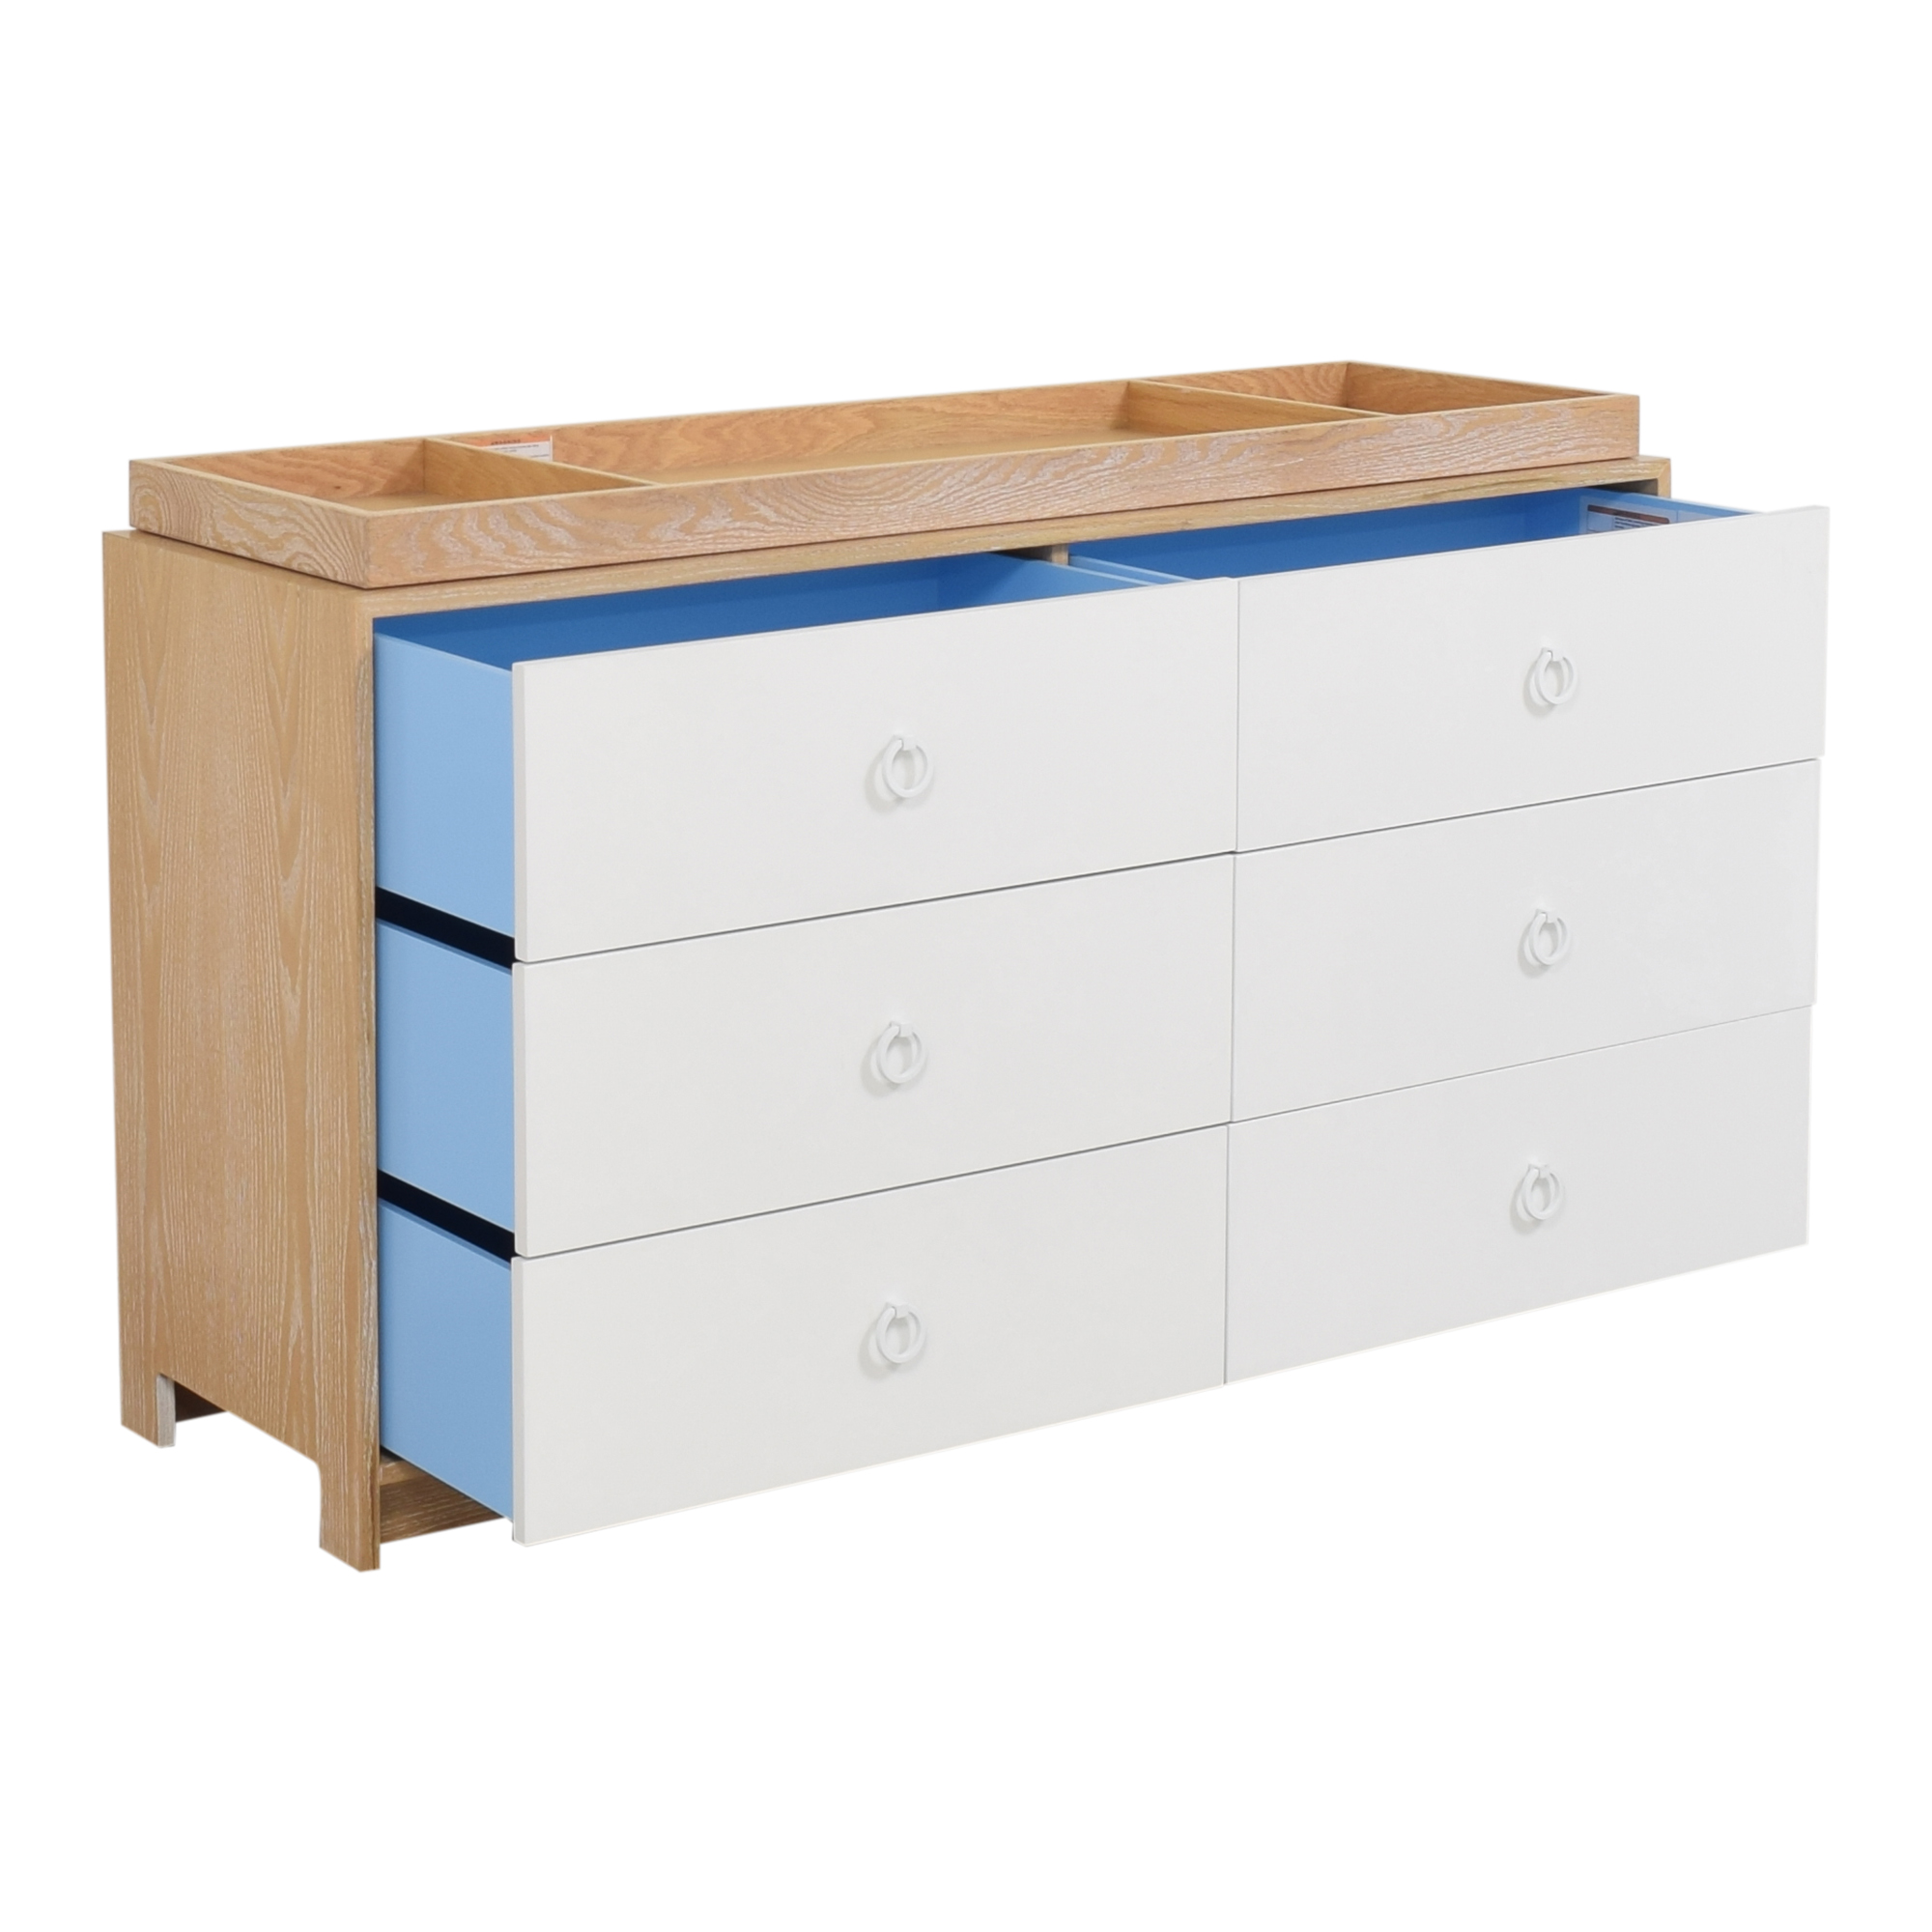 ducduc ducduc Cabana Doublewide Six Drawer Dresser ct